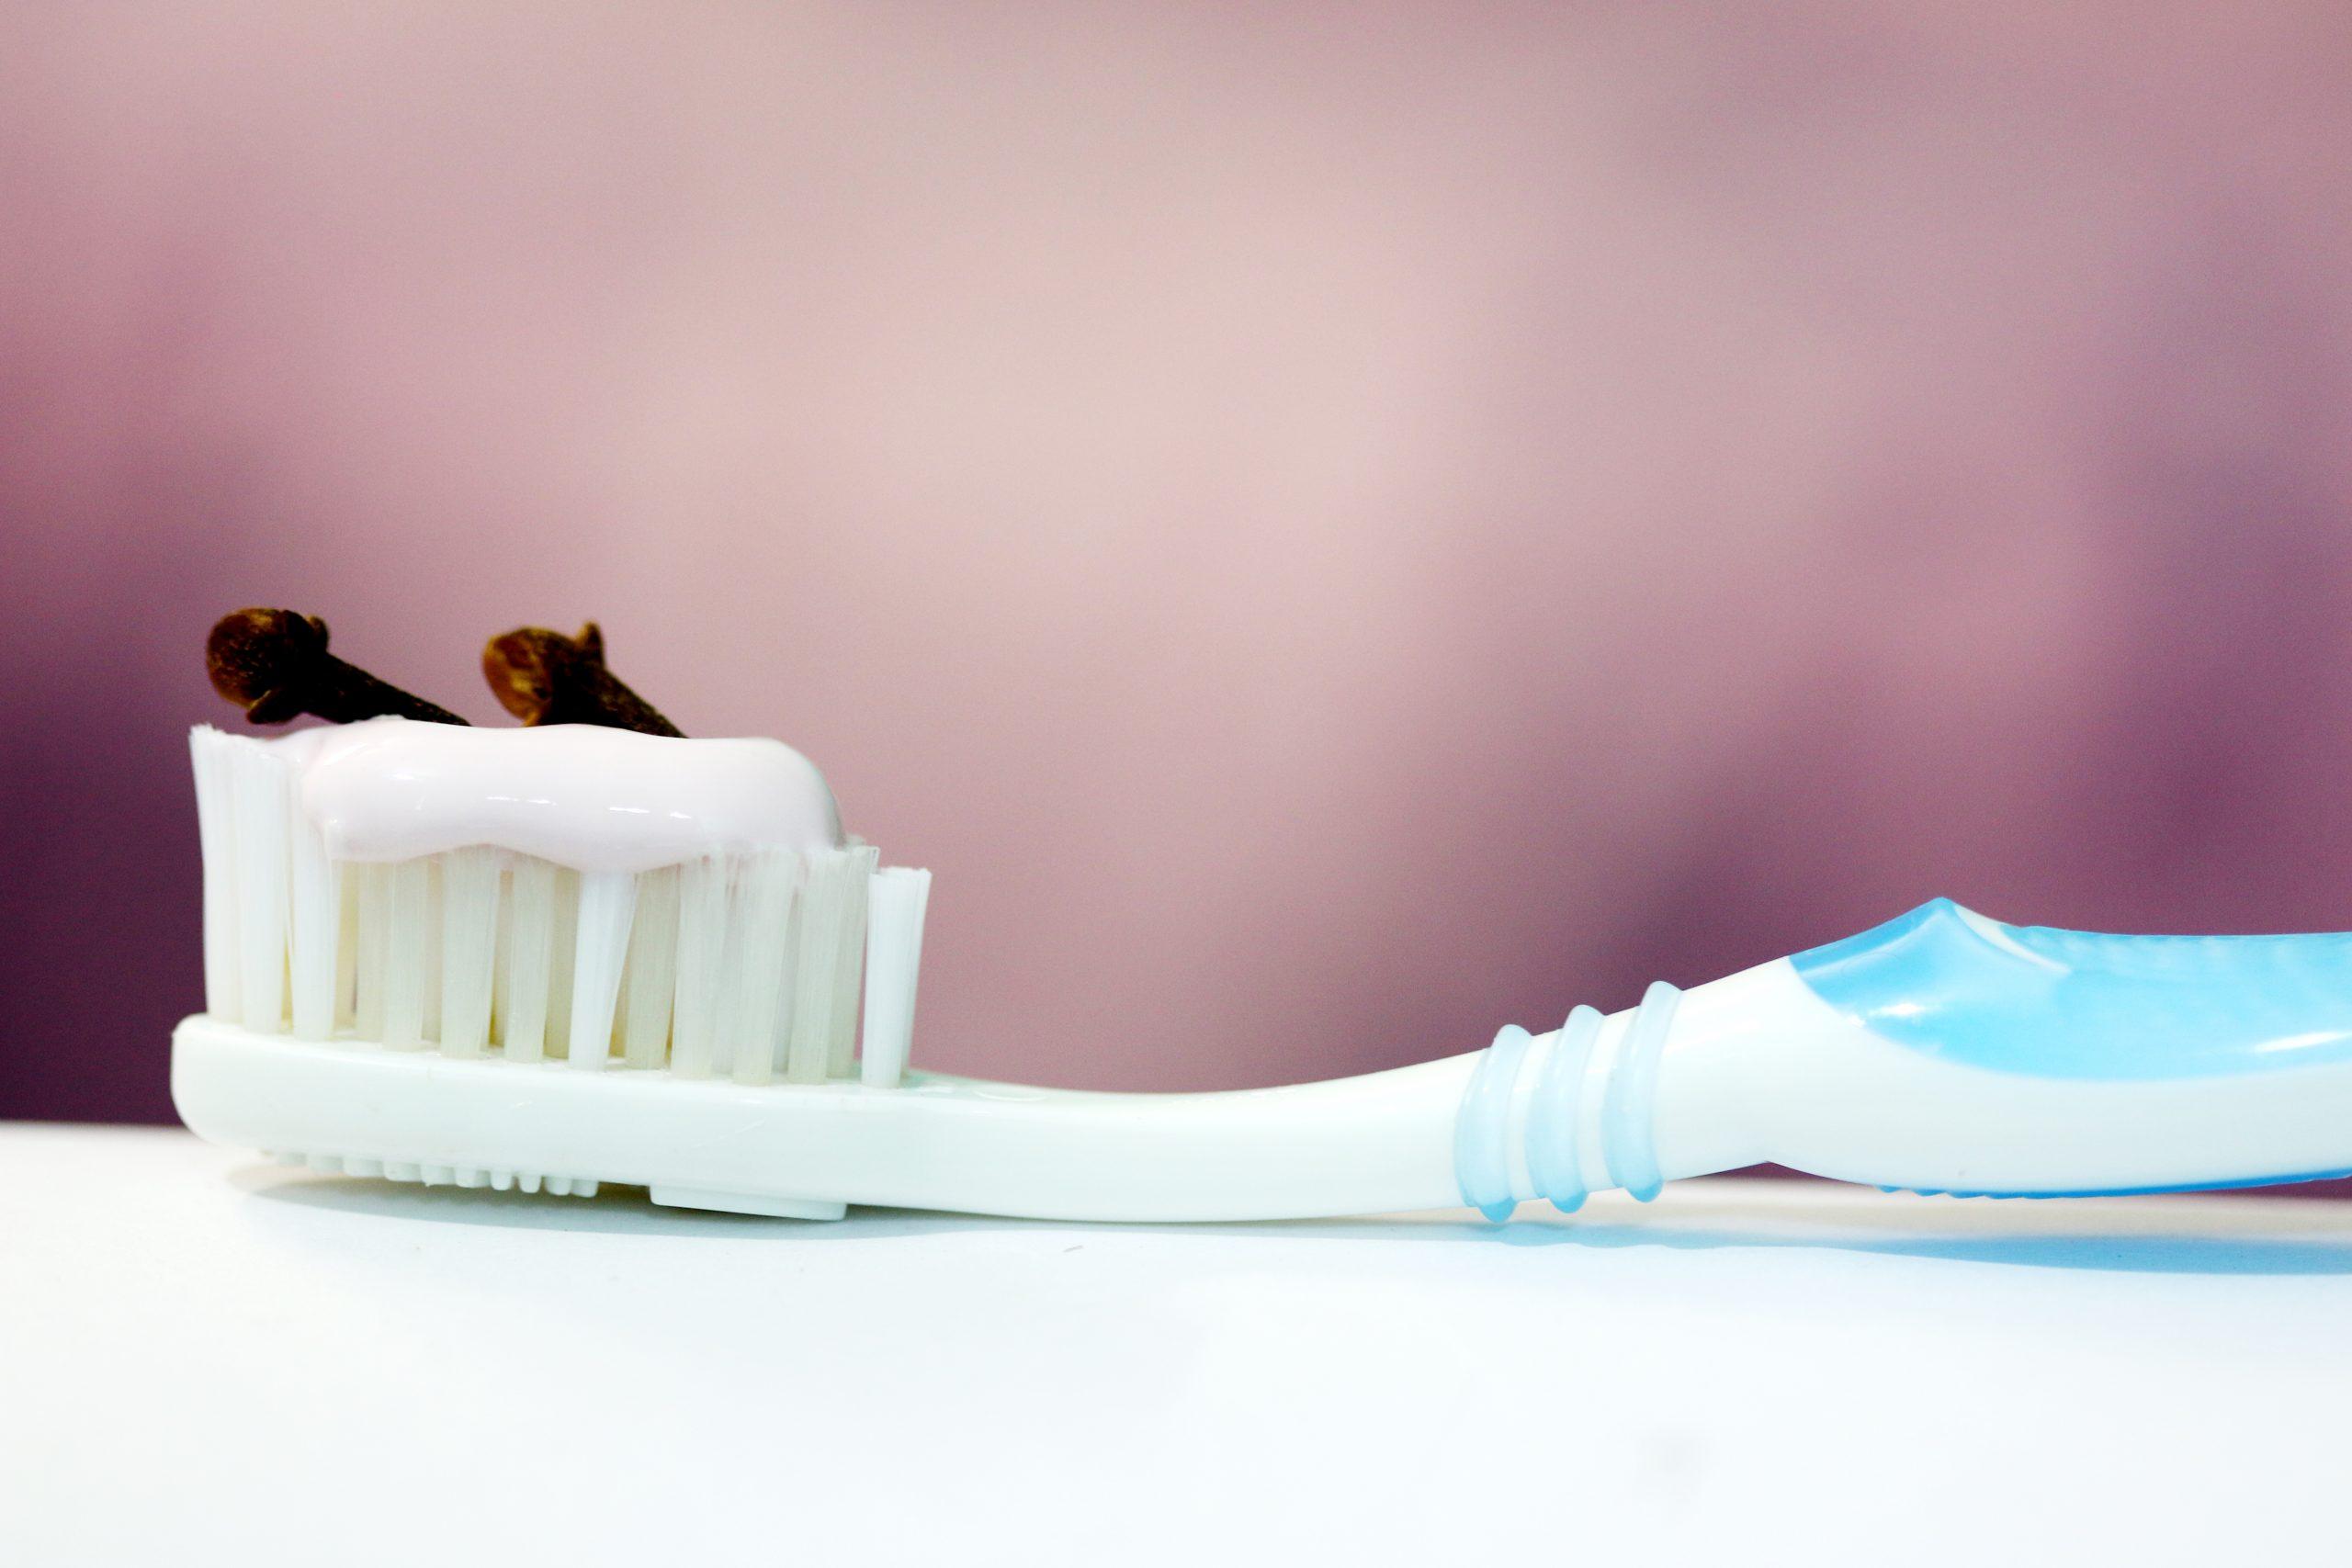 clove on toothbrush